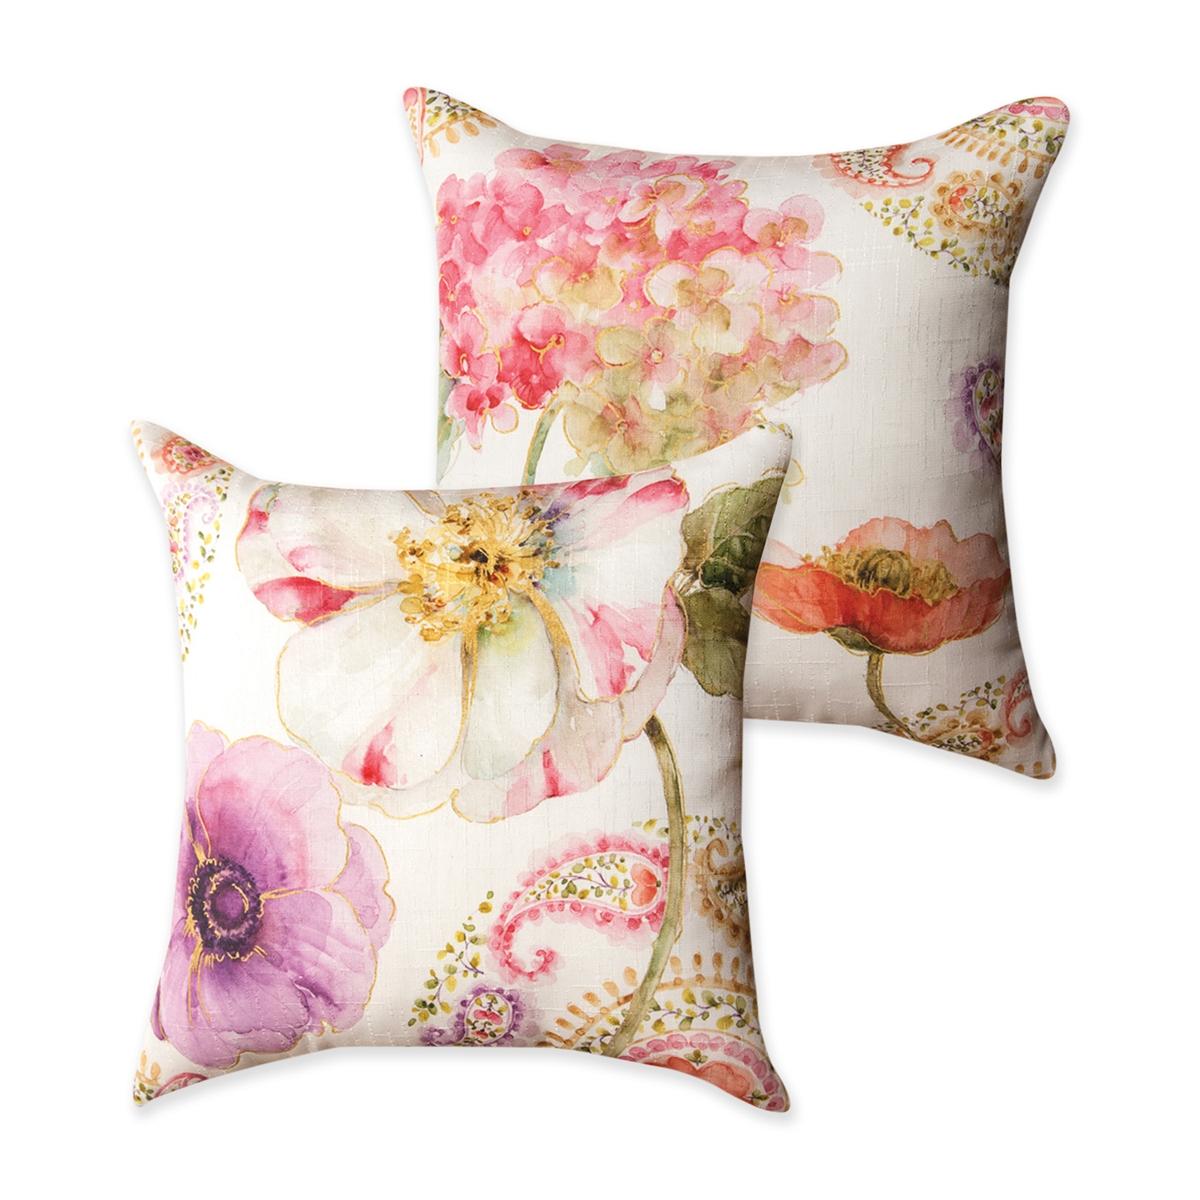 Rainbow Seeds Pillow